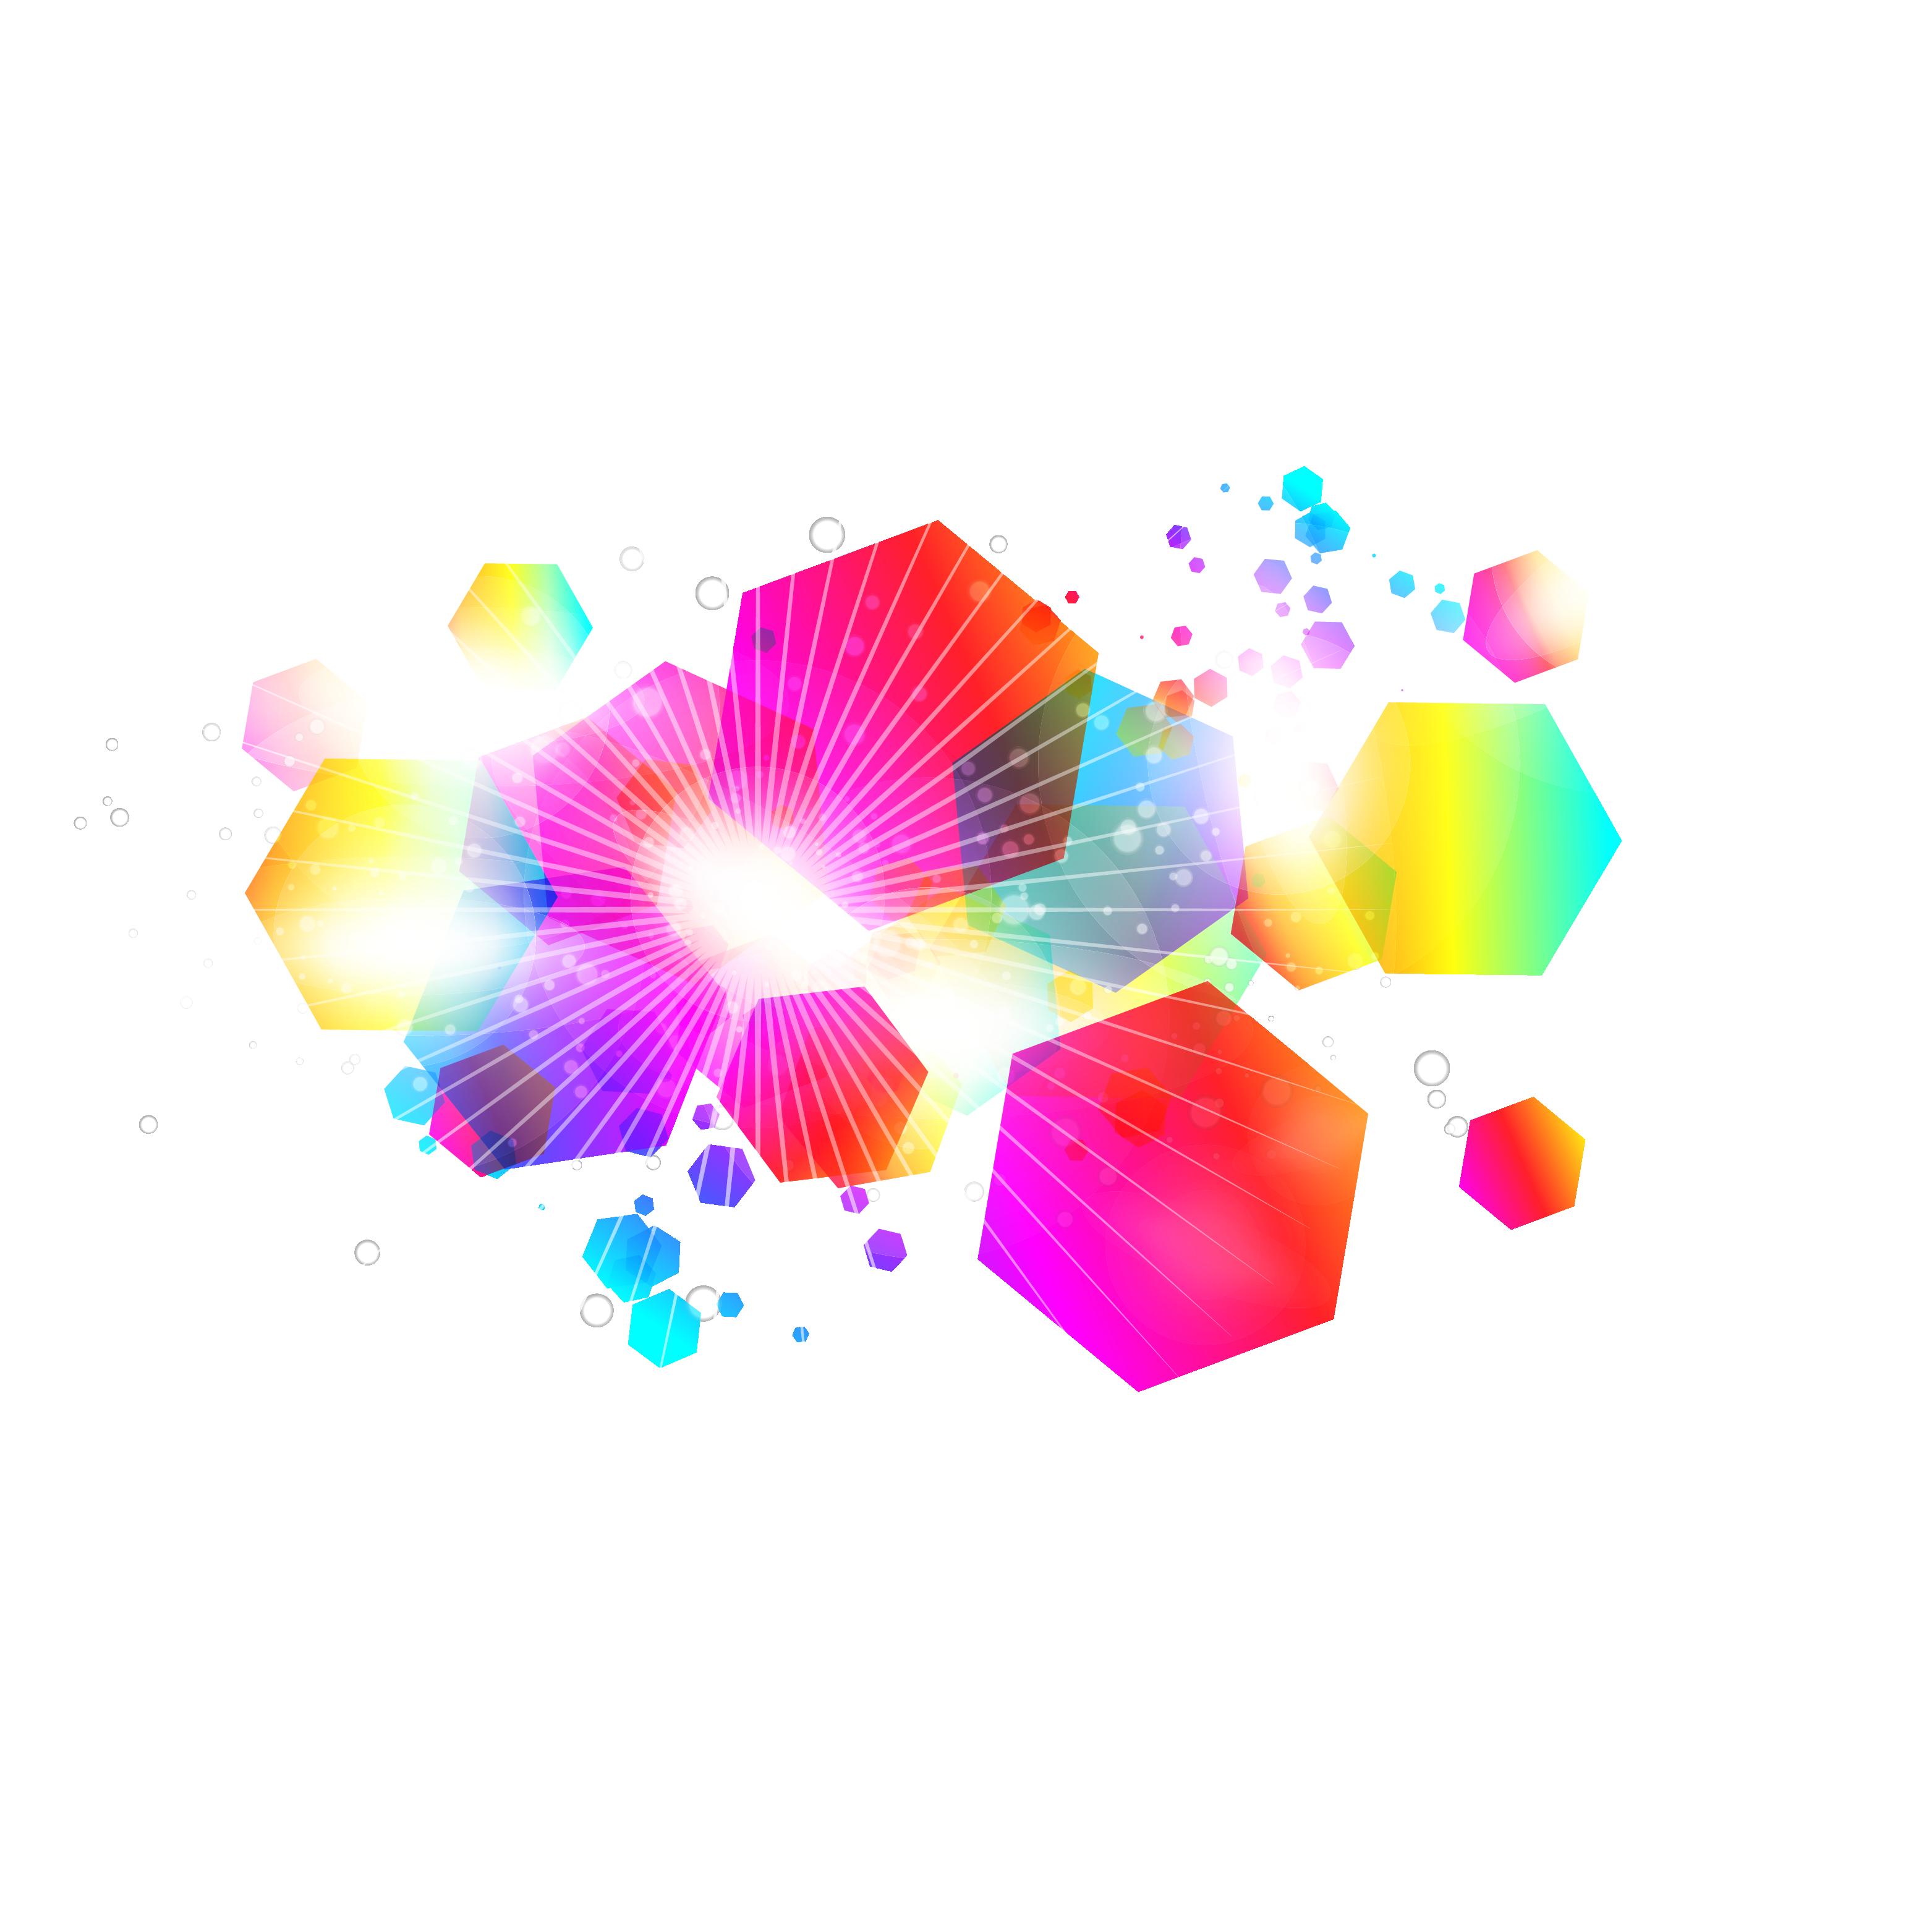 3125x3125 Color Hexagon Combination Background Vector 31253125 Transprent